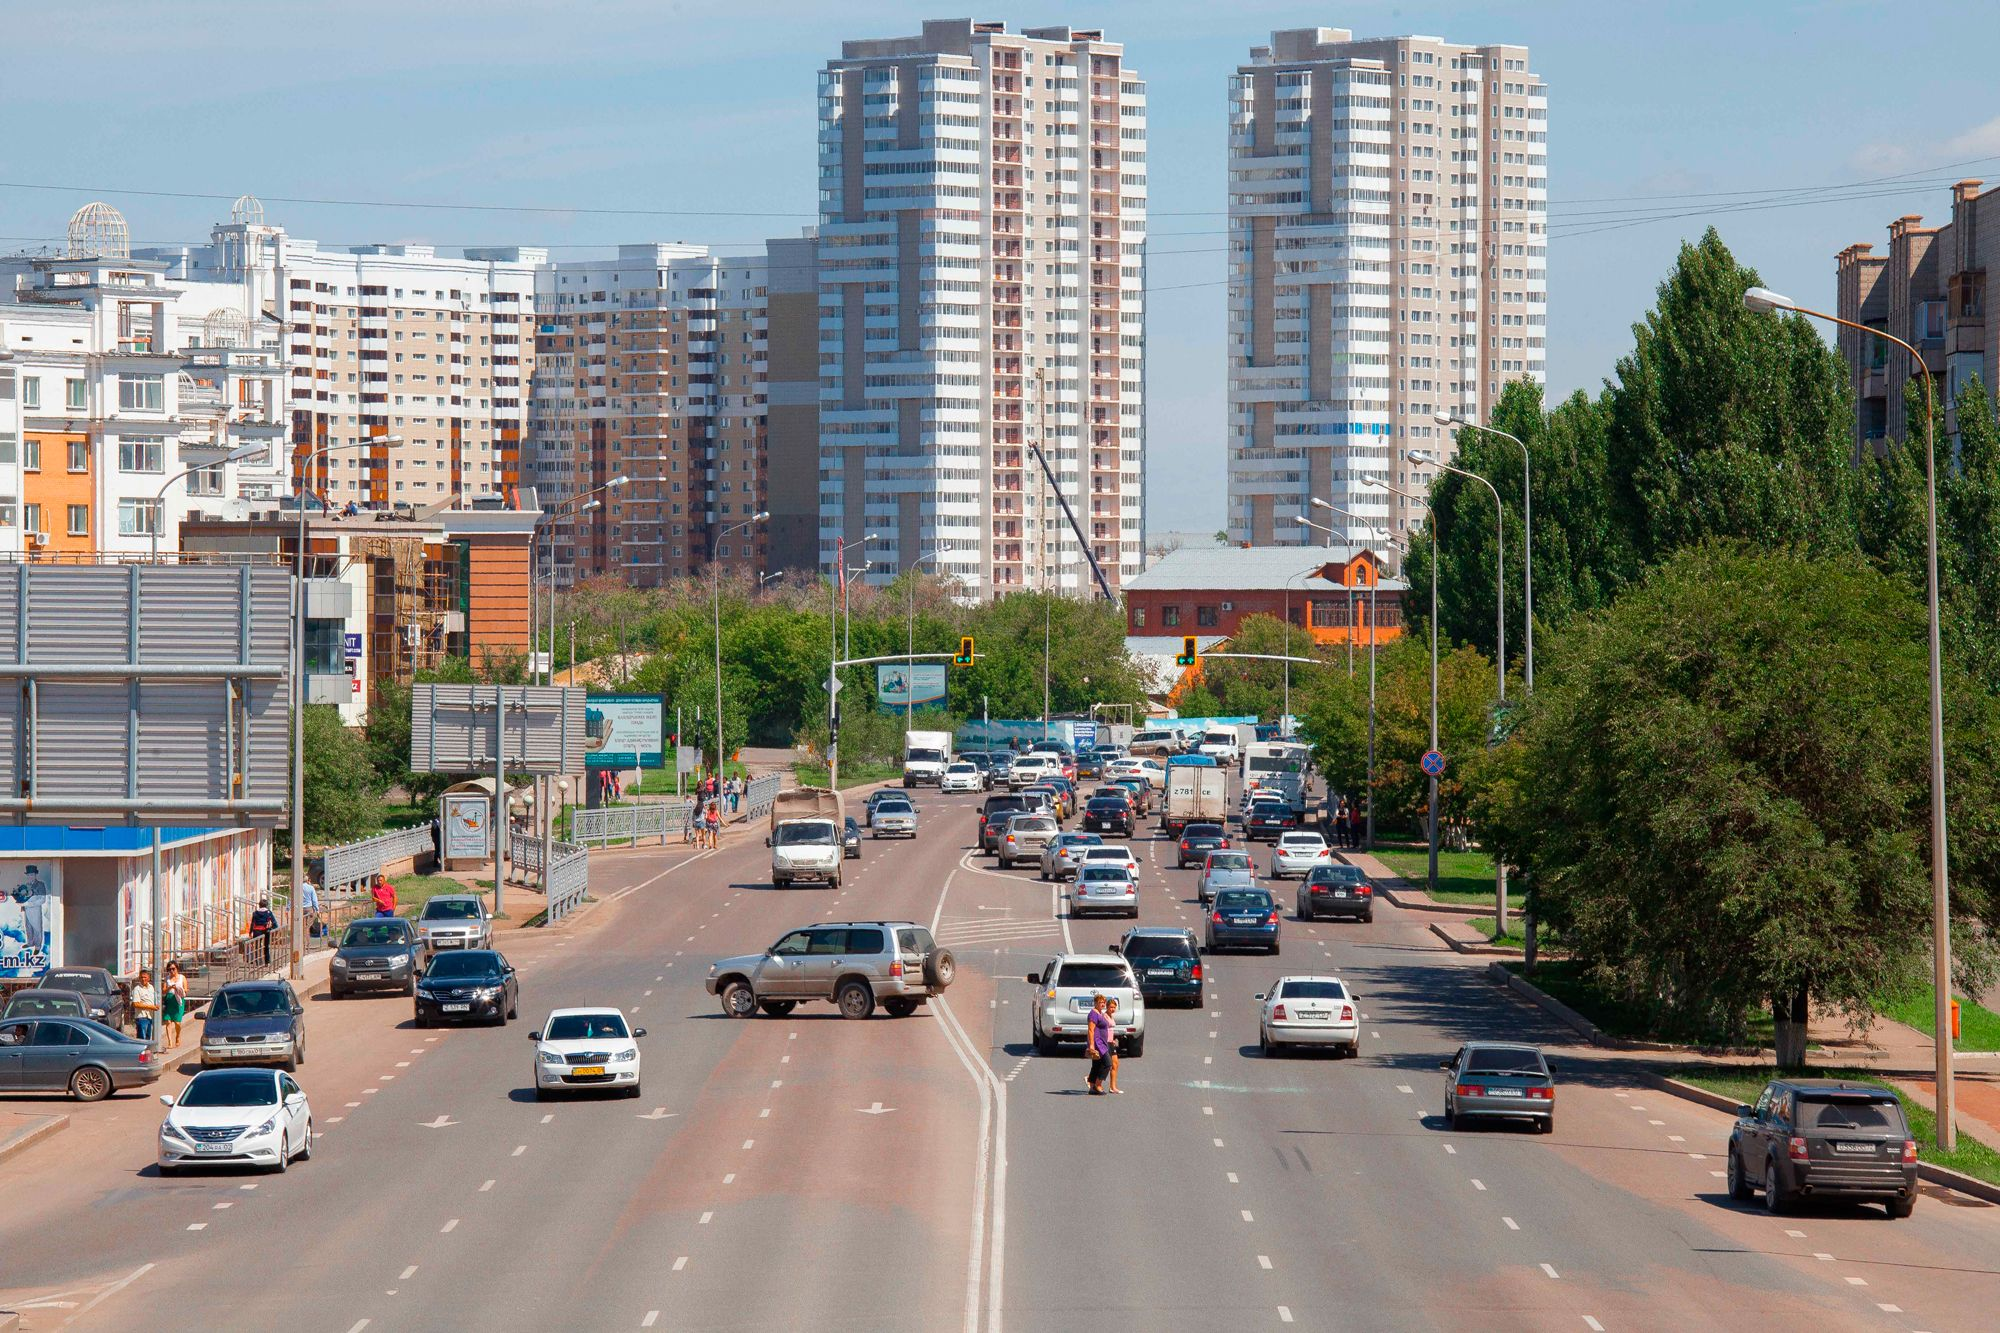 Объем инвестиций в жилищное строительство Астаны – 74,1 млрд тенге - Kapital.kz